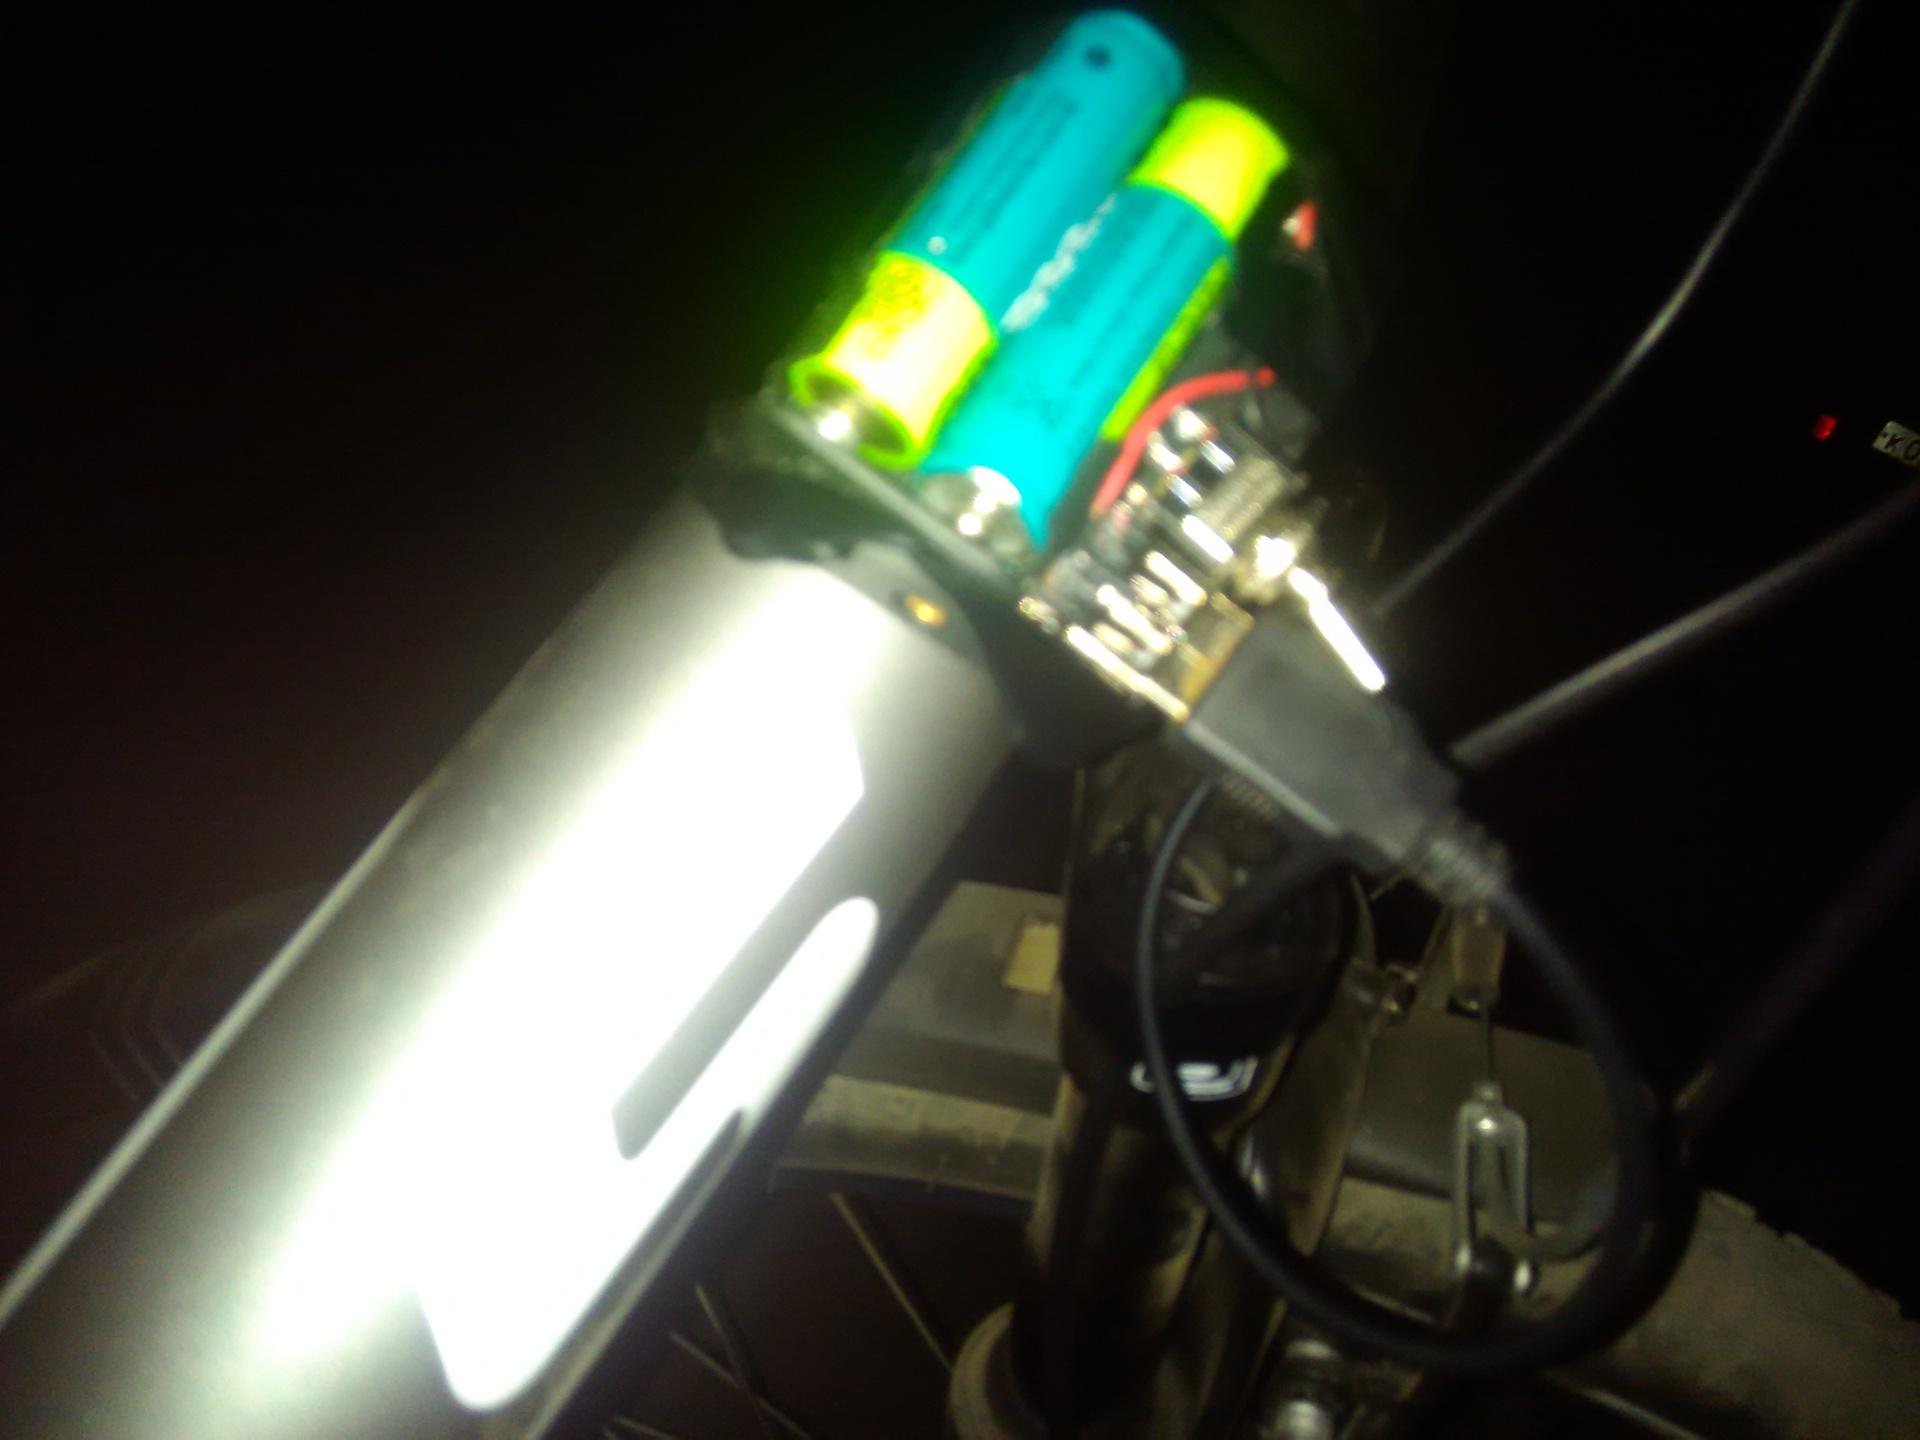 Спидометр для велосипеда своими руками фото 968